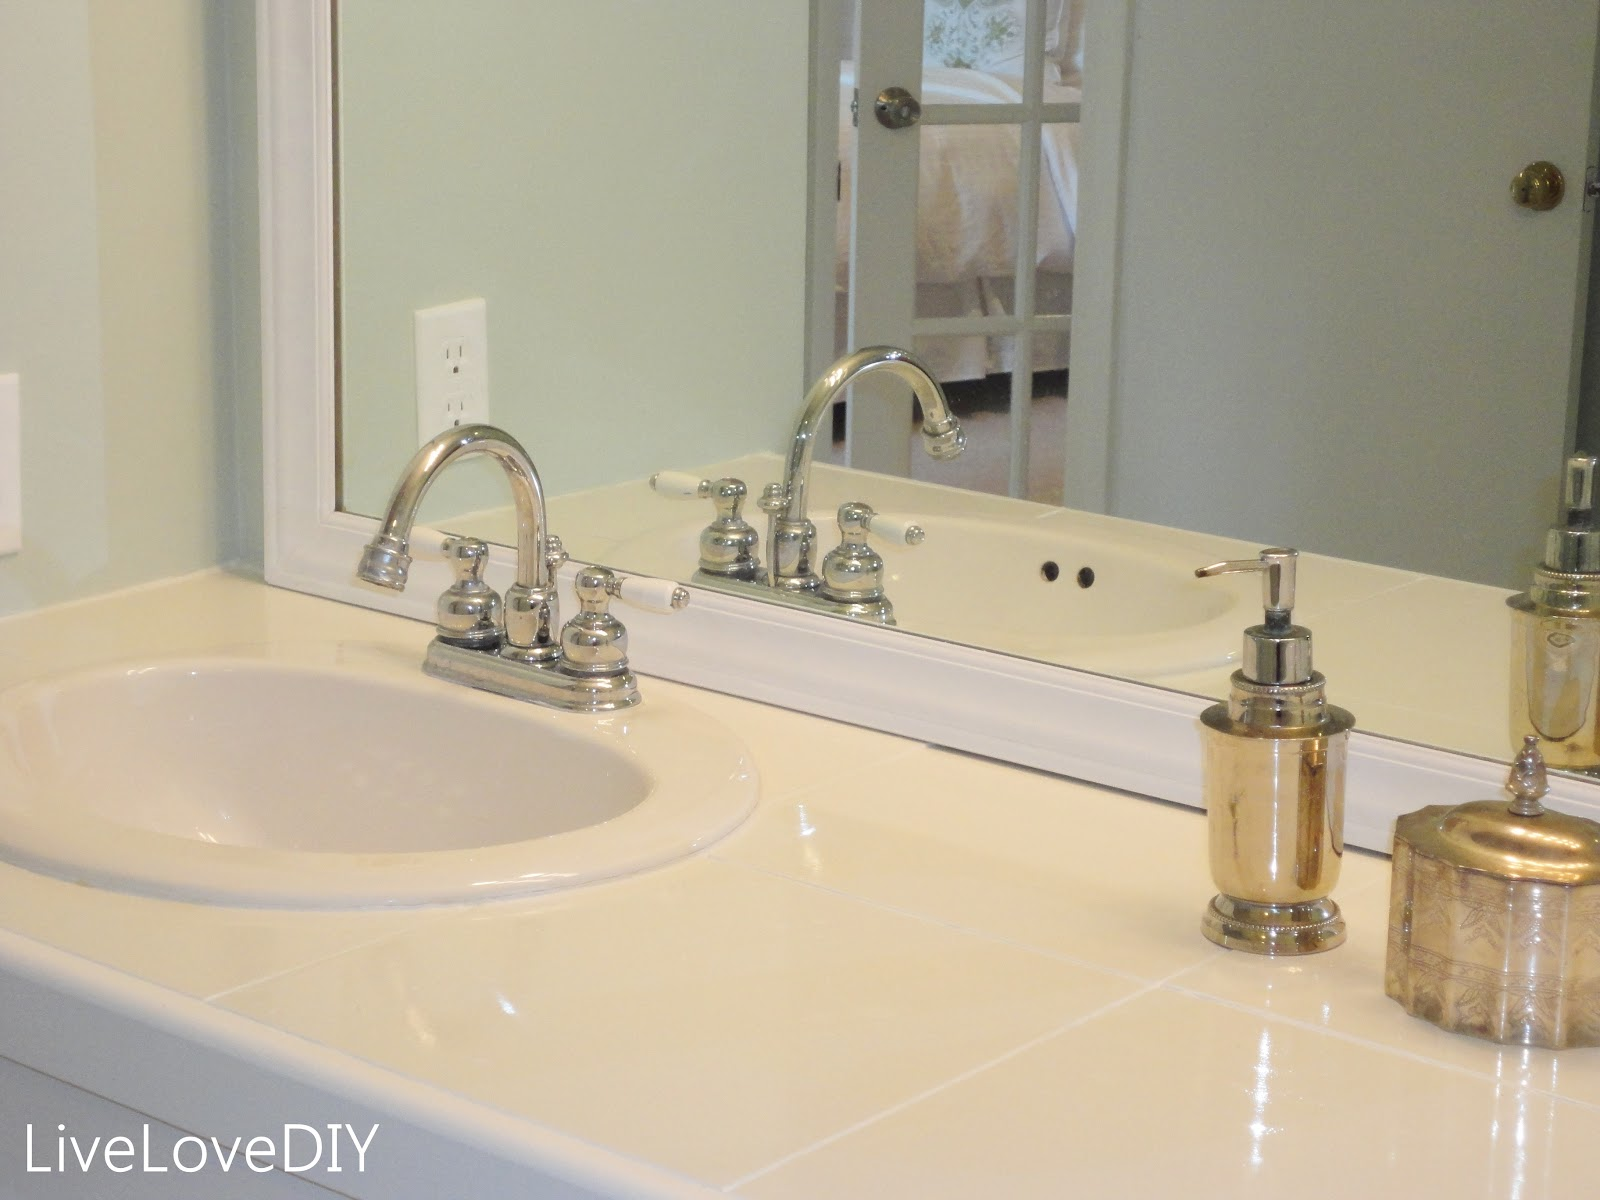 Popular LiveLoveDIY: Easy DIY Ideas for Updating Your Bathroom! QA75